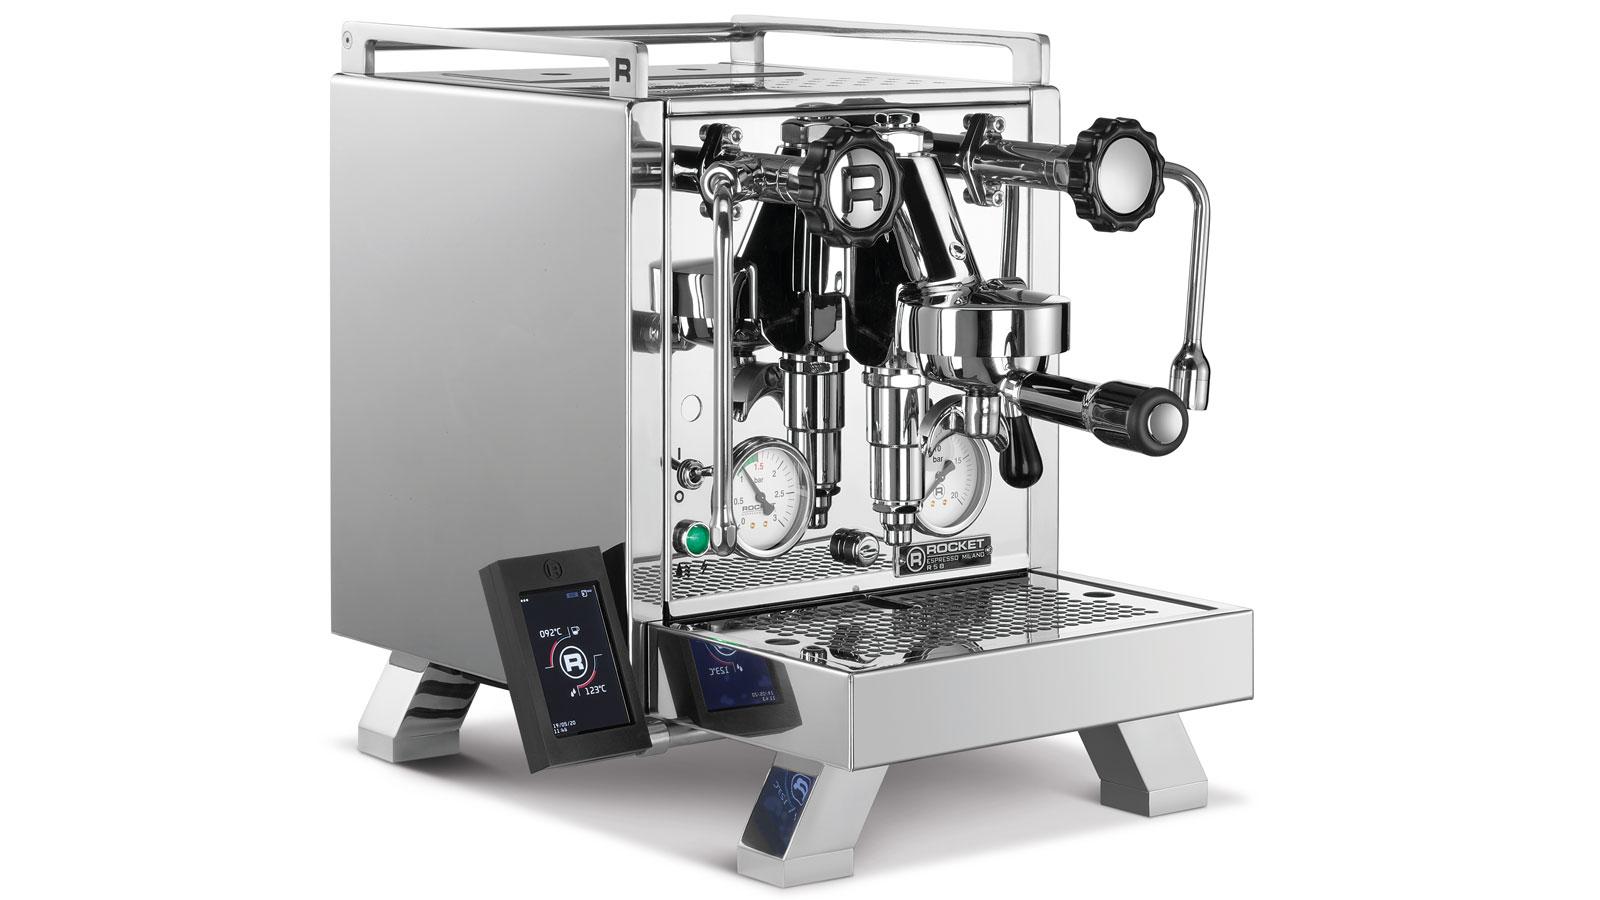 best-gadgets-rocket-espresso-r-cinquantotto-coffee-machine